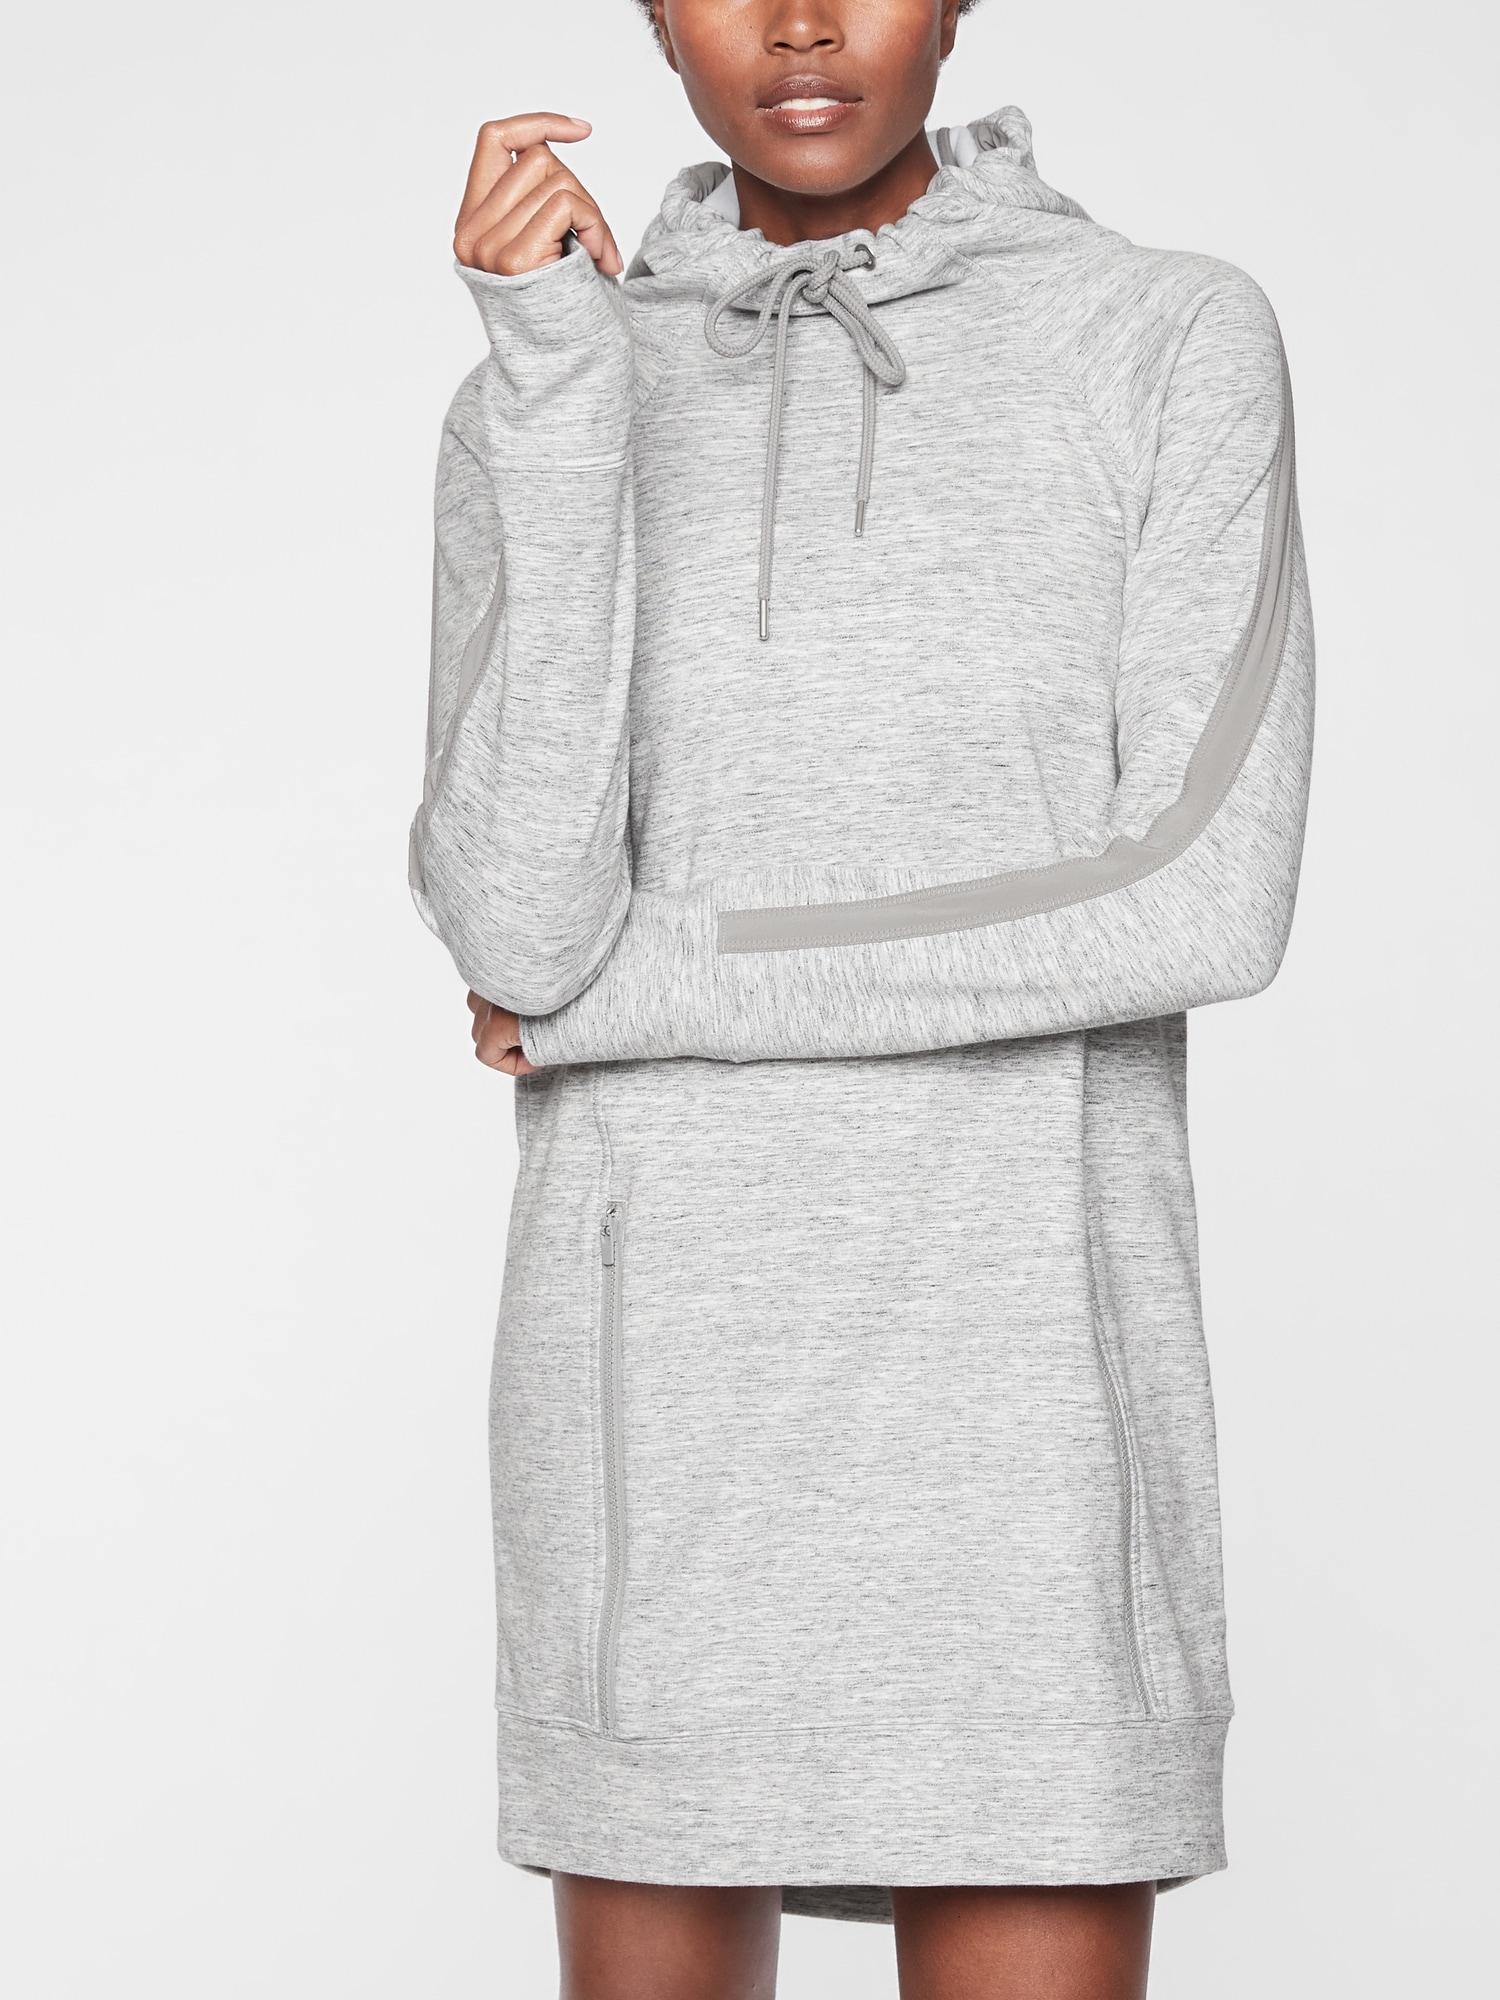 a22d9f1e6f6 Lyst - Athleta Victory Sweatshirt Dress in Gray